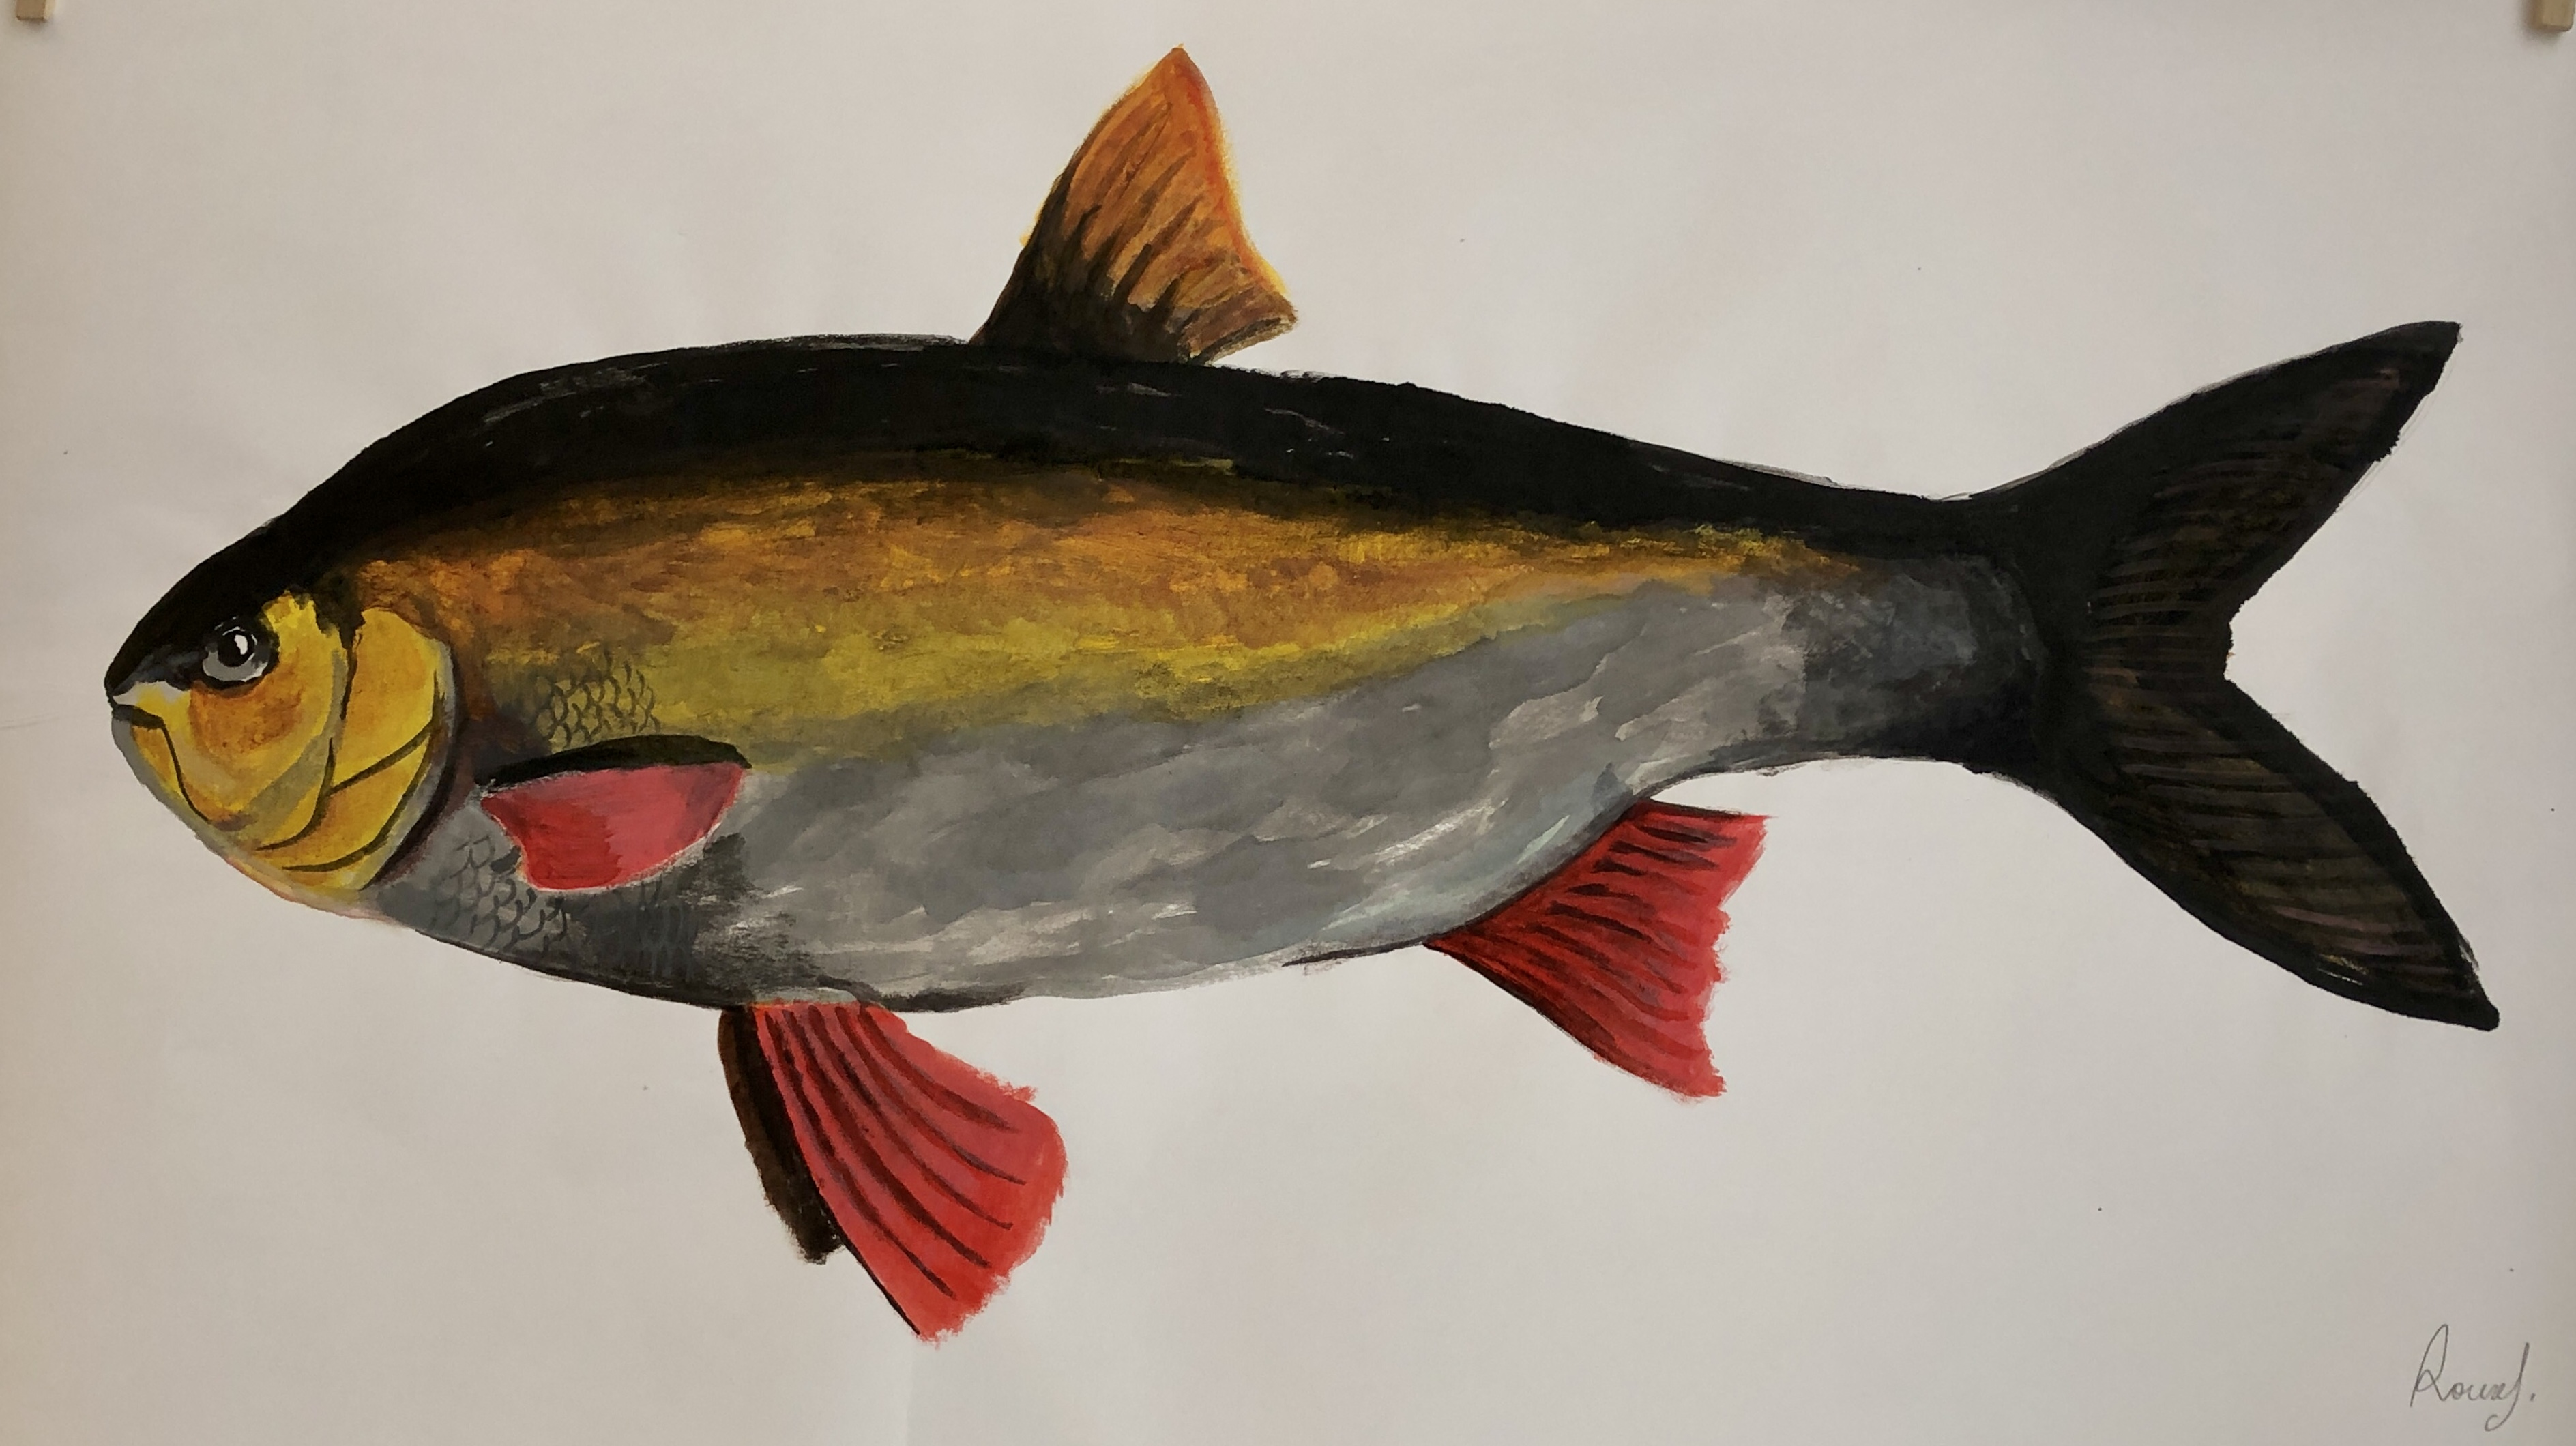 Fish 36, 2020, Tinte, Gouache, Acryl auf Japanpapier, 45 x 85 cm